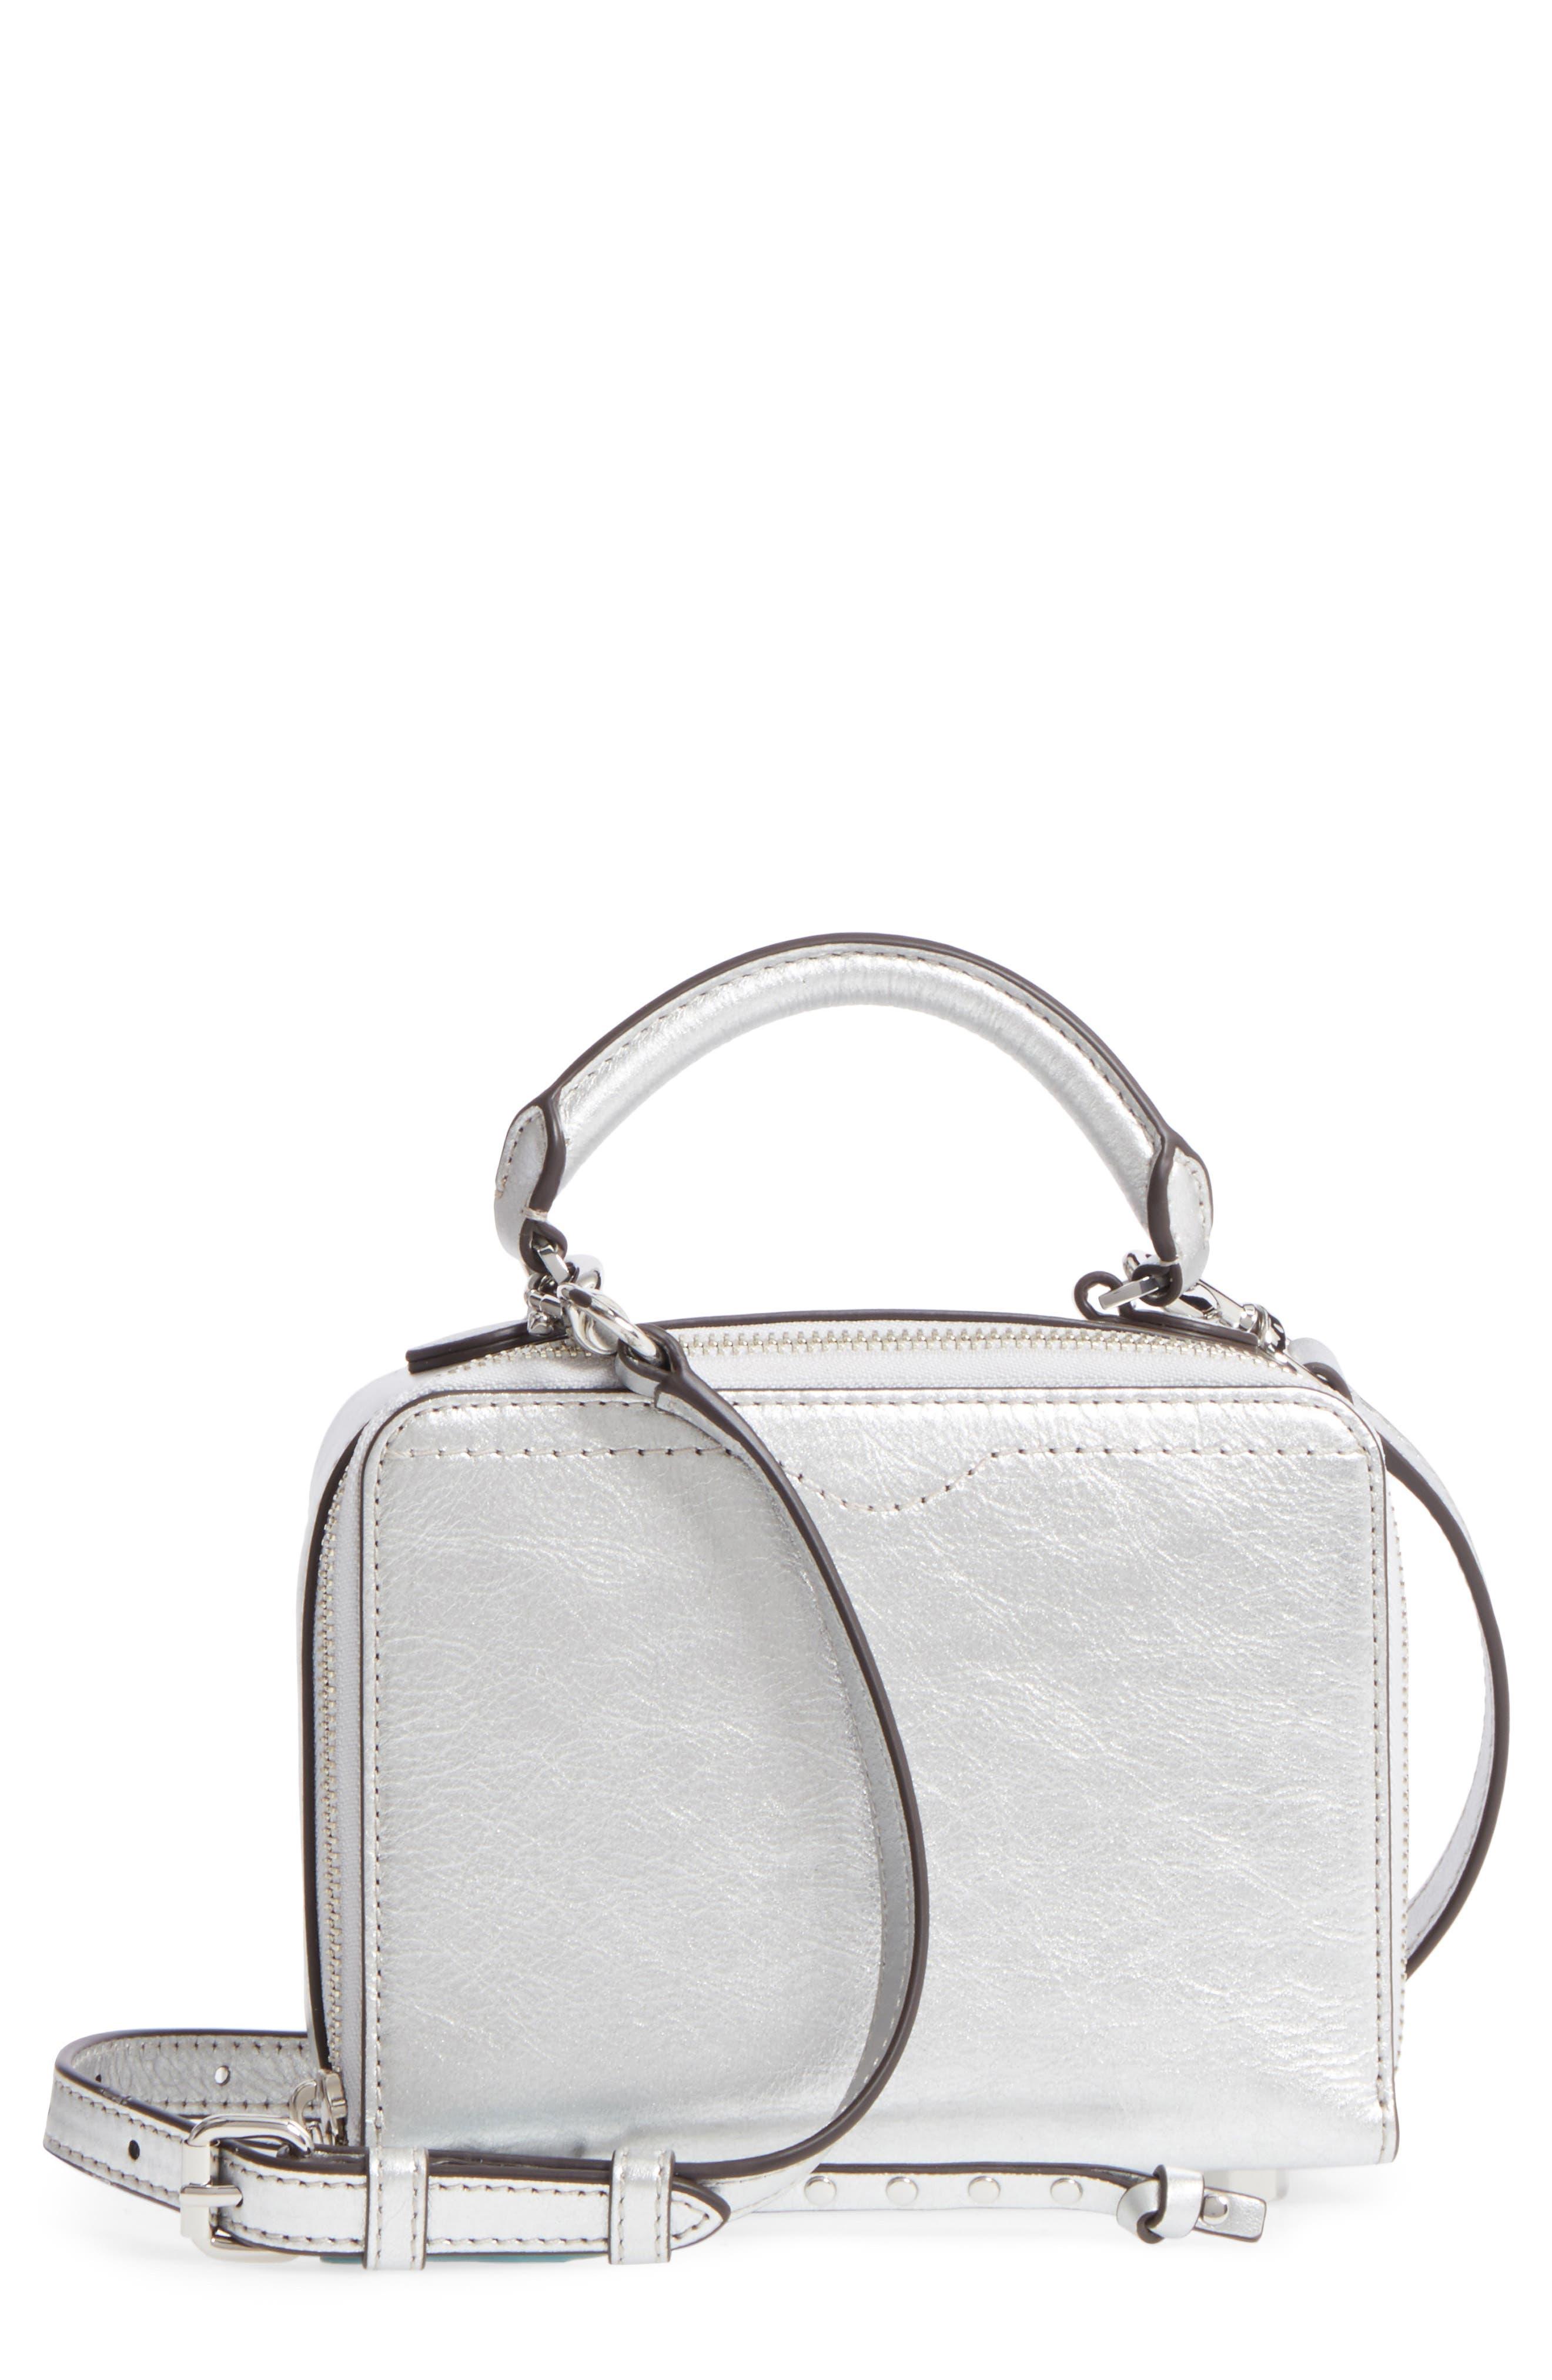 Rebecca Minkoff Box Metallic Leather Crossbody Bag